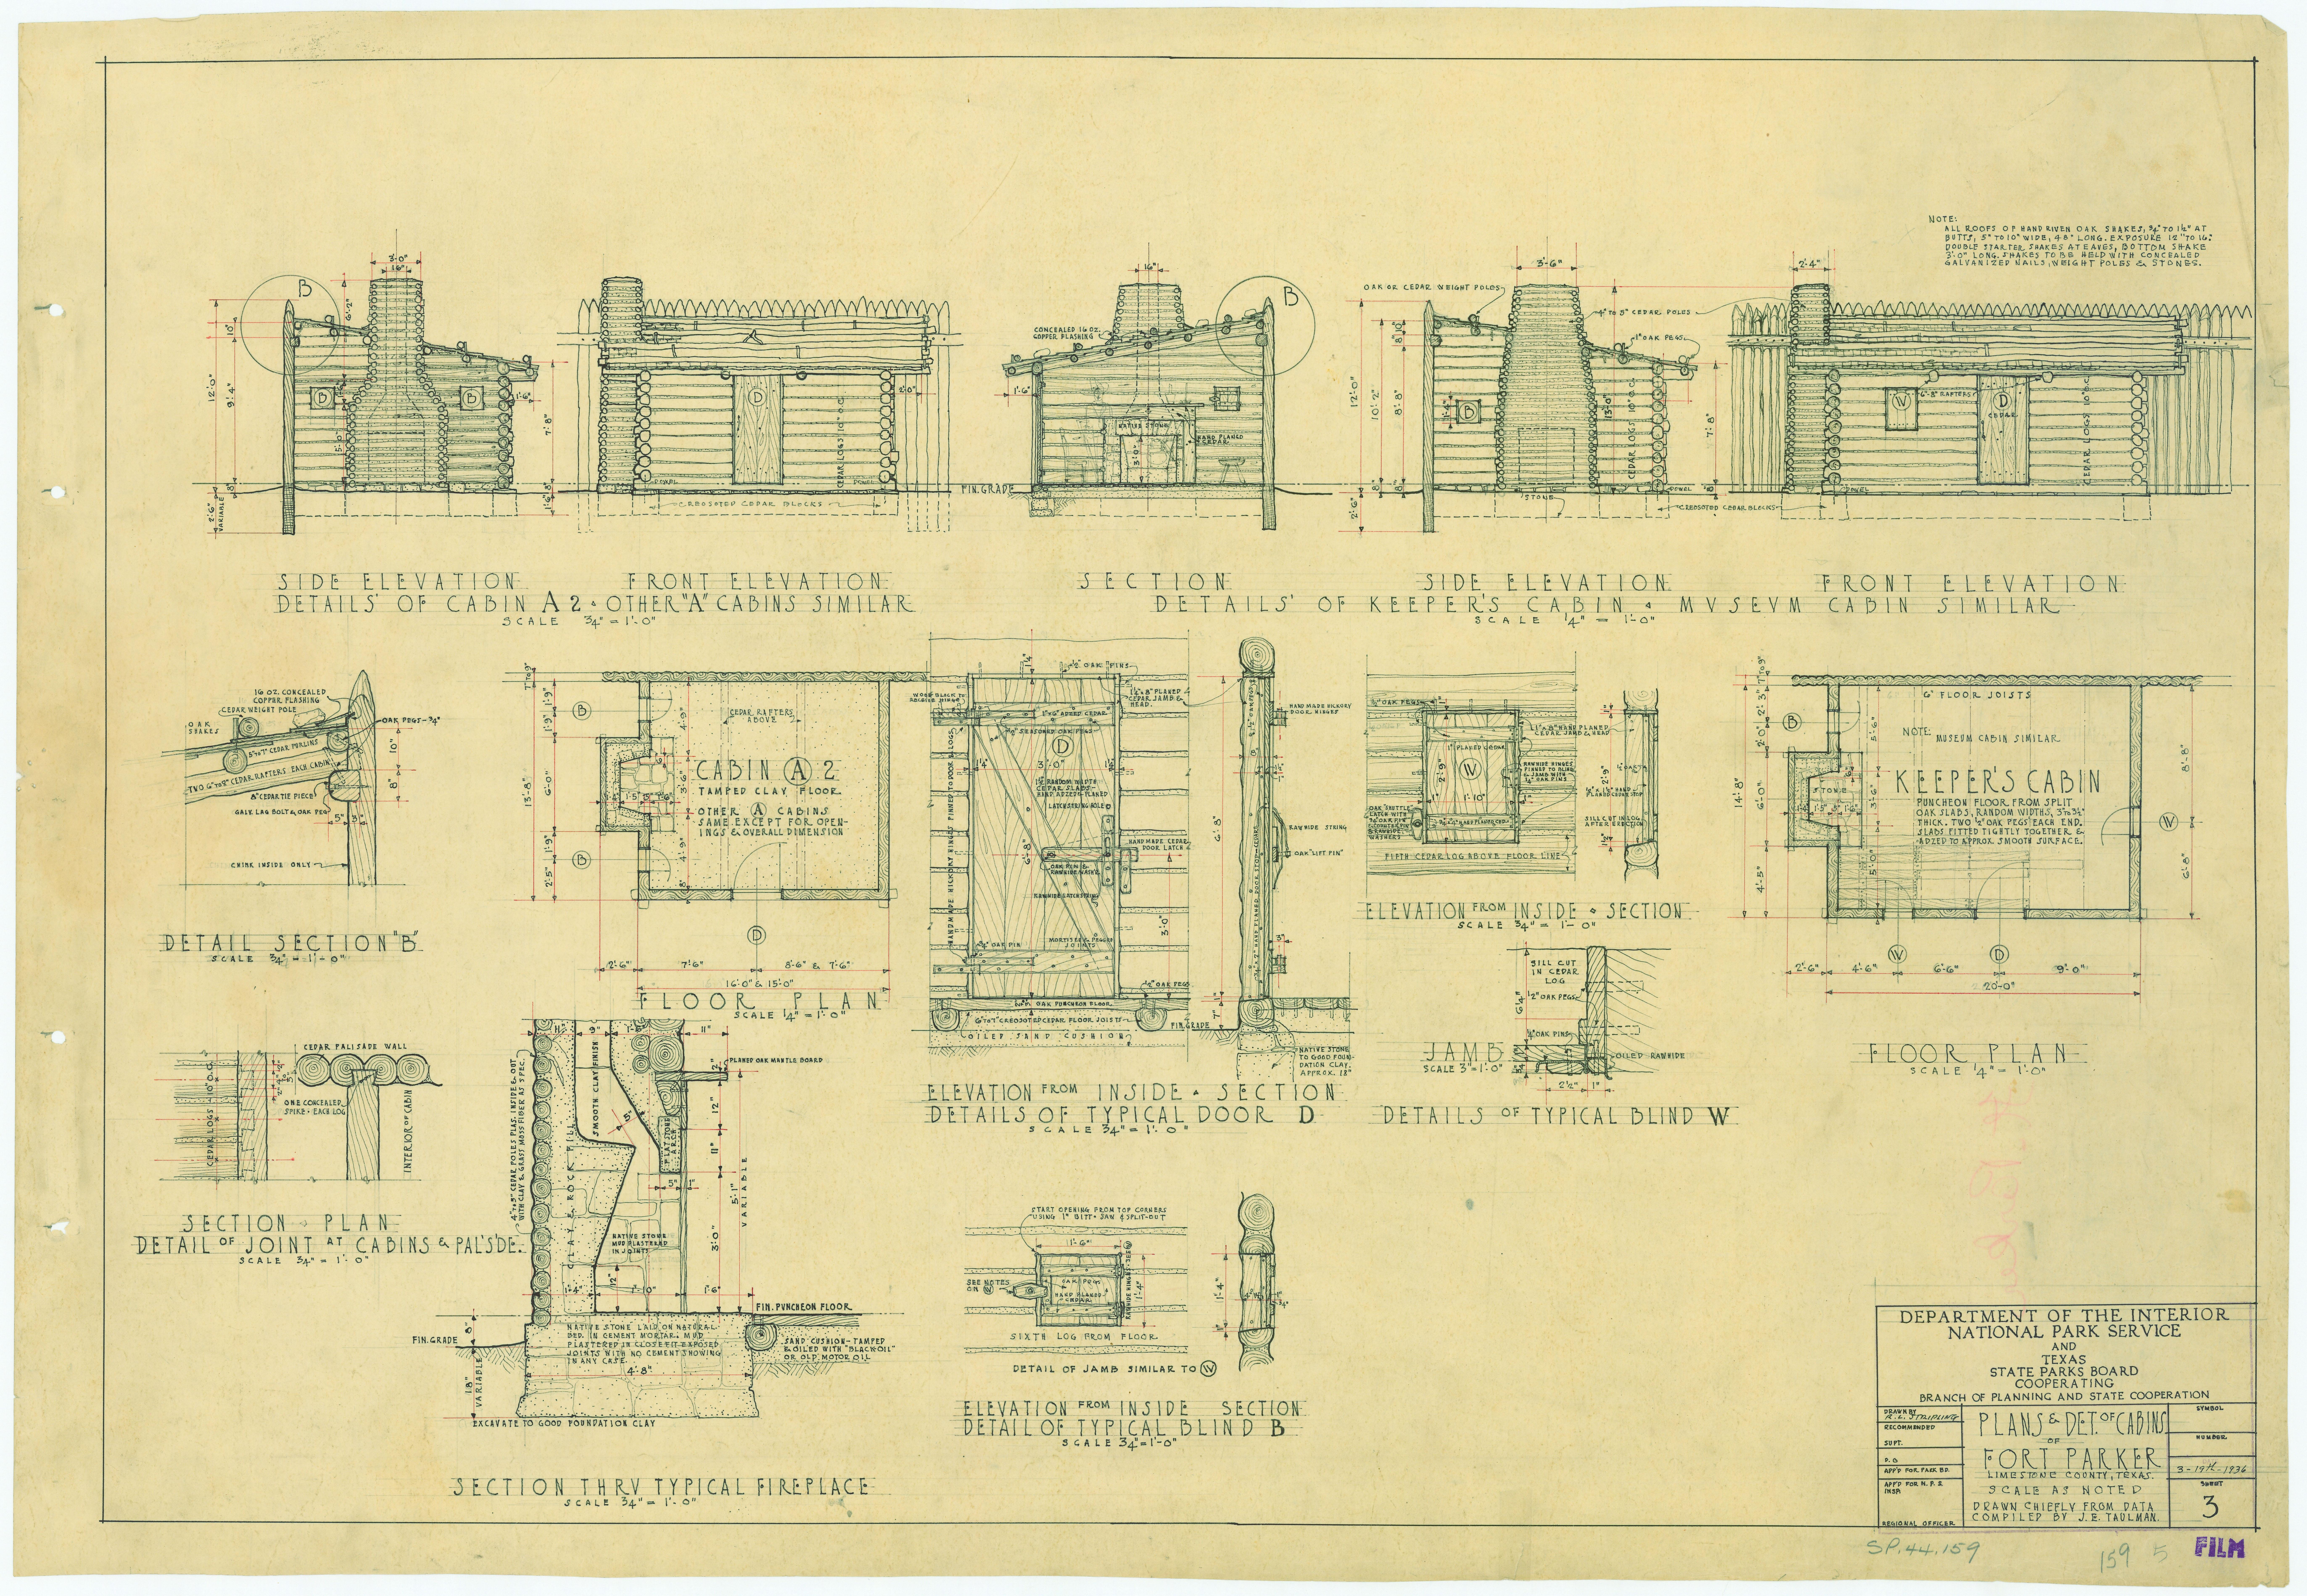 Fort Parker State Park - Plans and Details of Cabins - SP.44_159